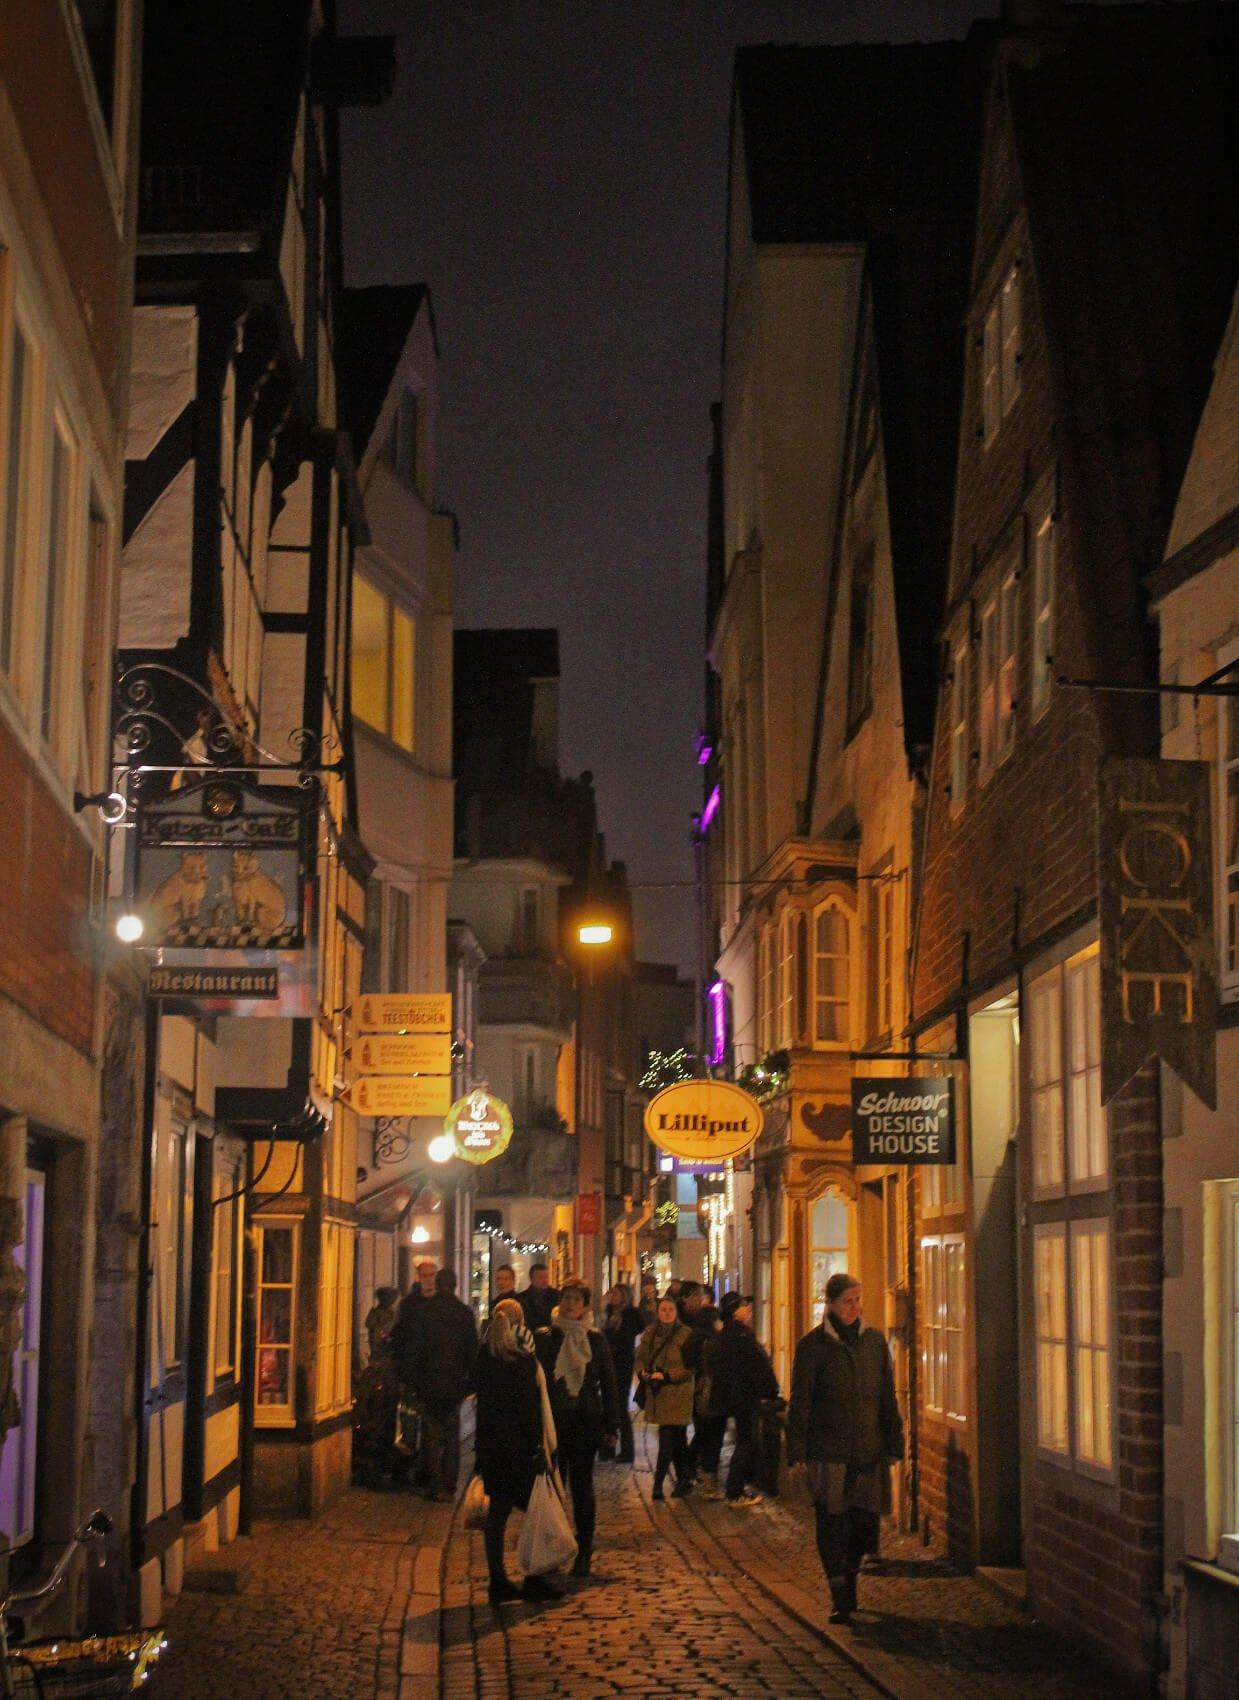 The Schnoor historic alley in Bremen, Germany in the winter.